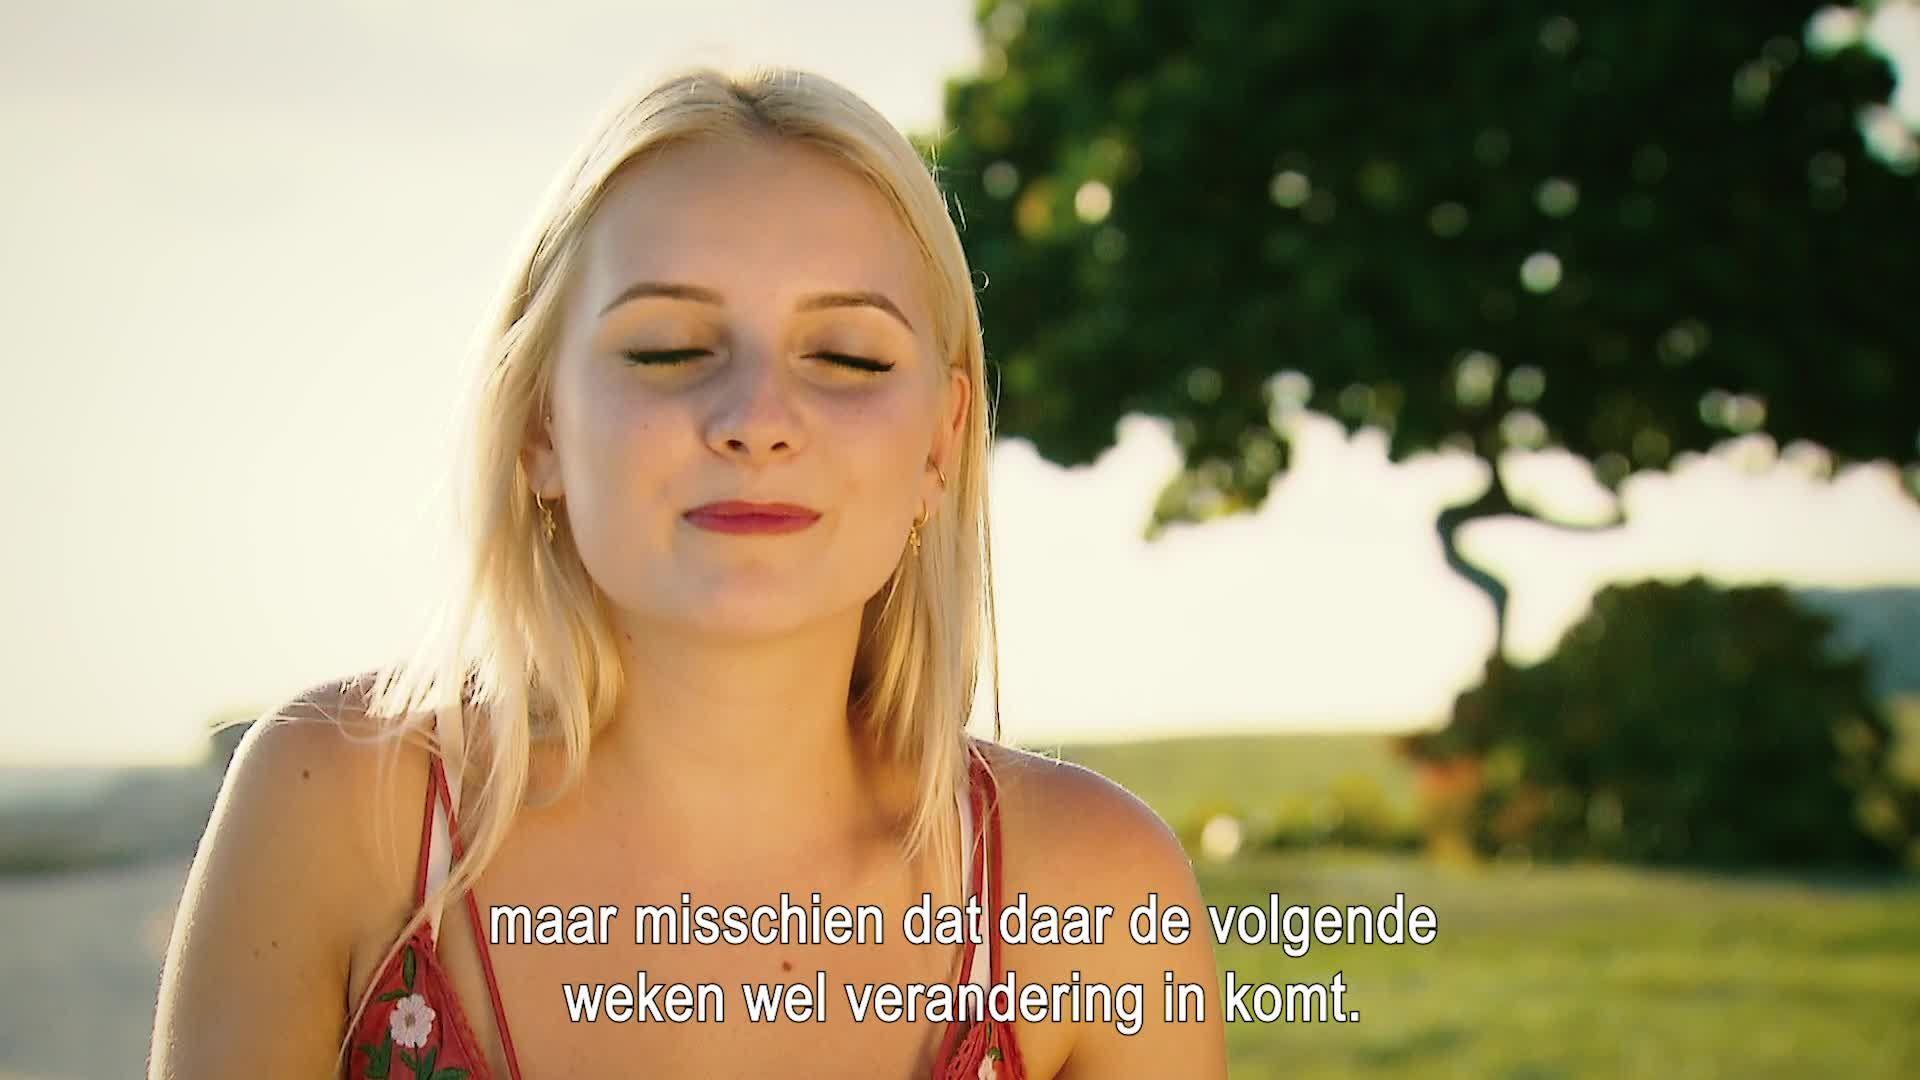 mgid:arc:content:nl.mtv.be:fef09429-cfa1